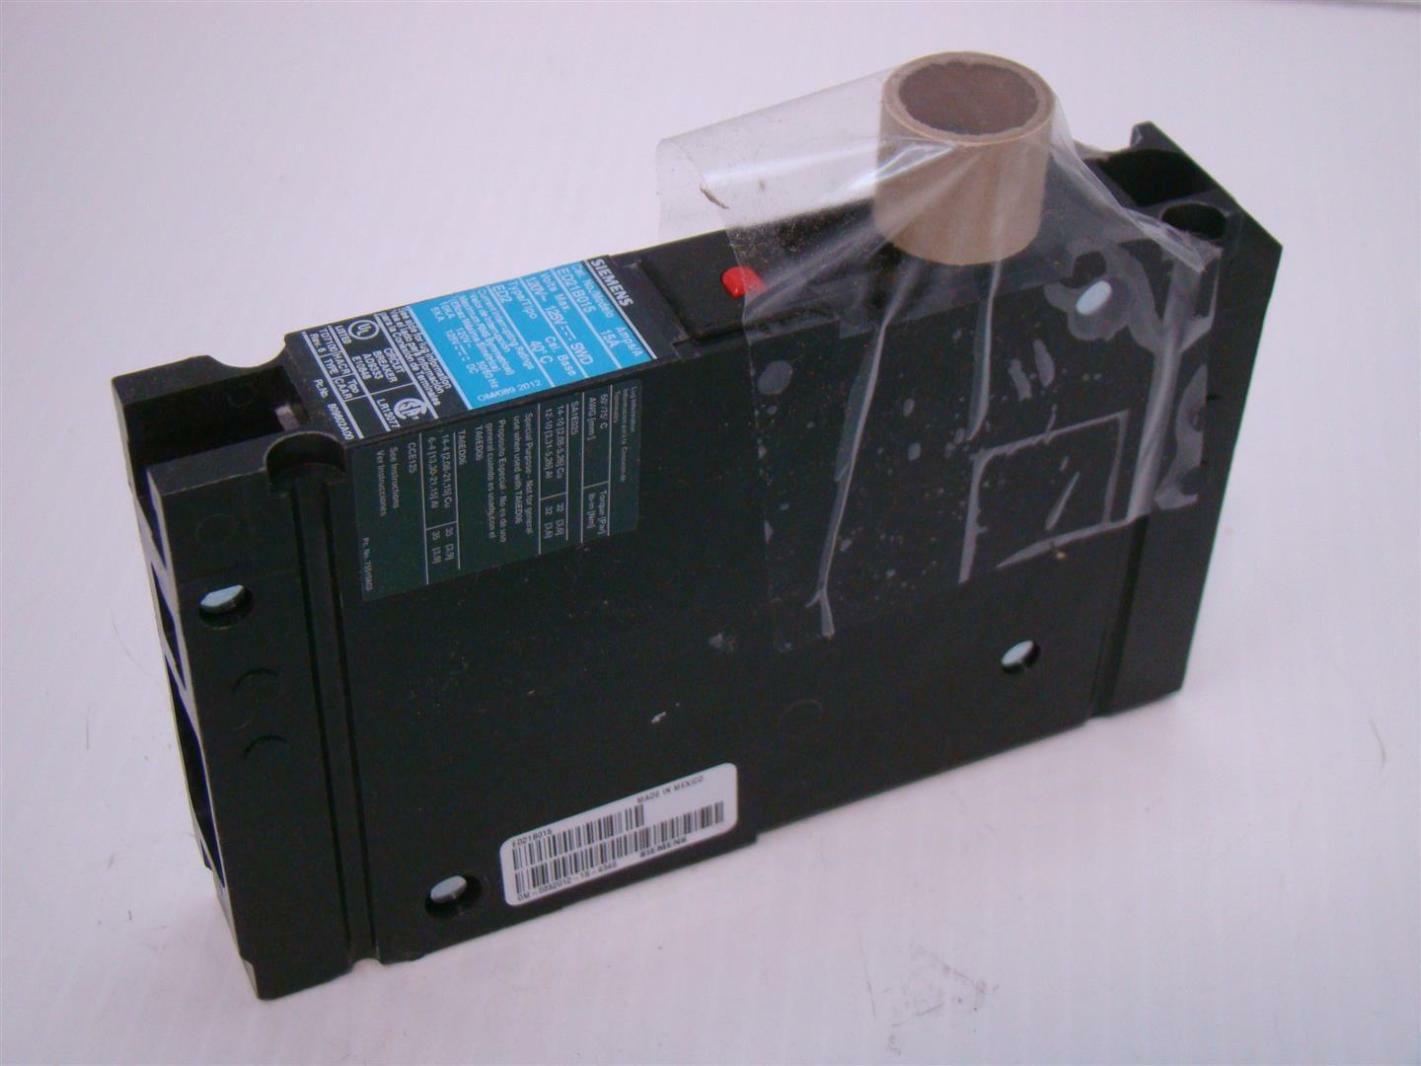 Square D 15a 1p Gfci Circuit Breaker At Searscom